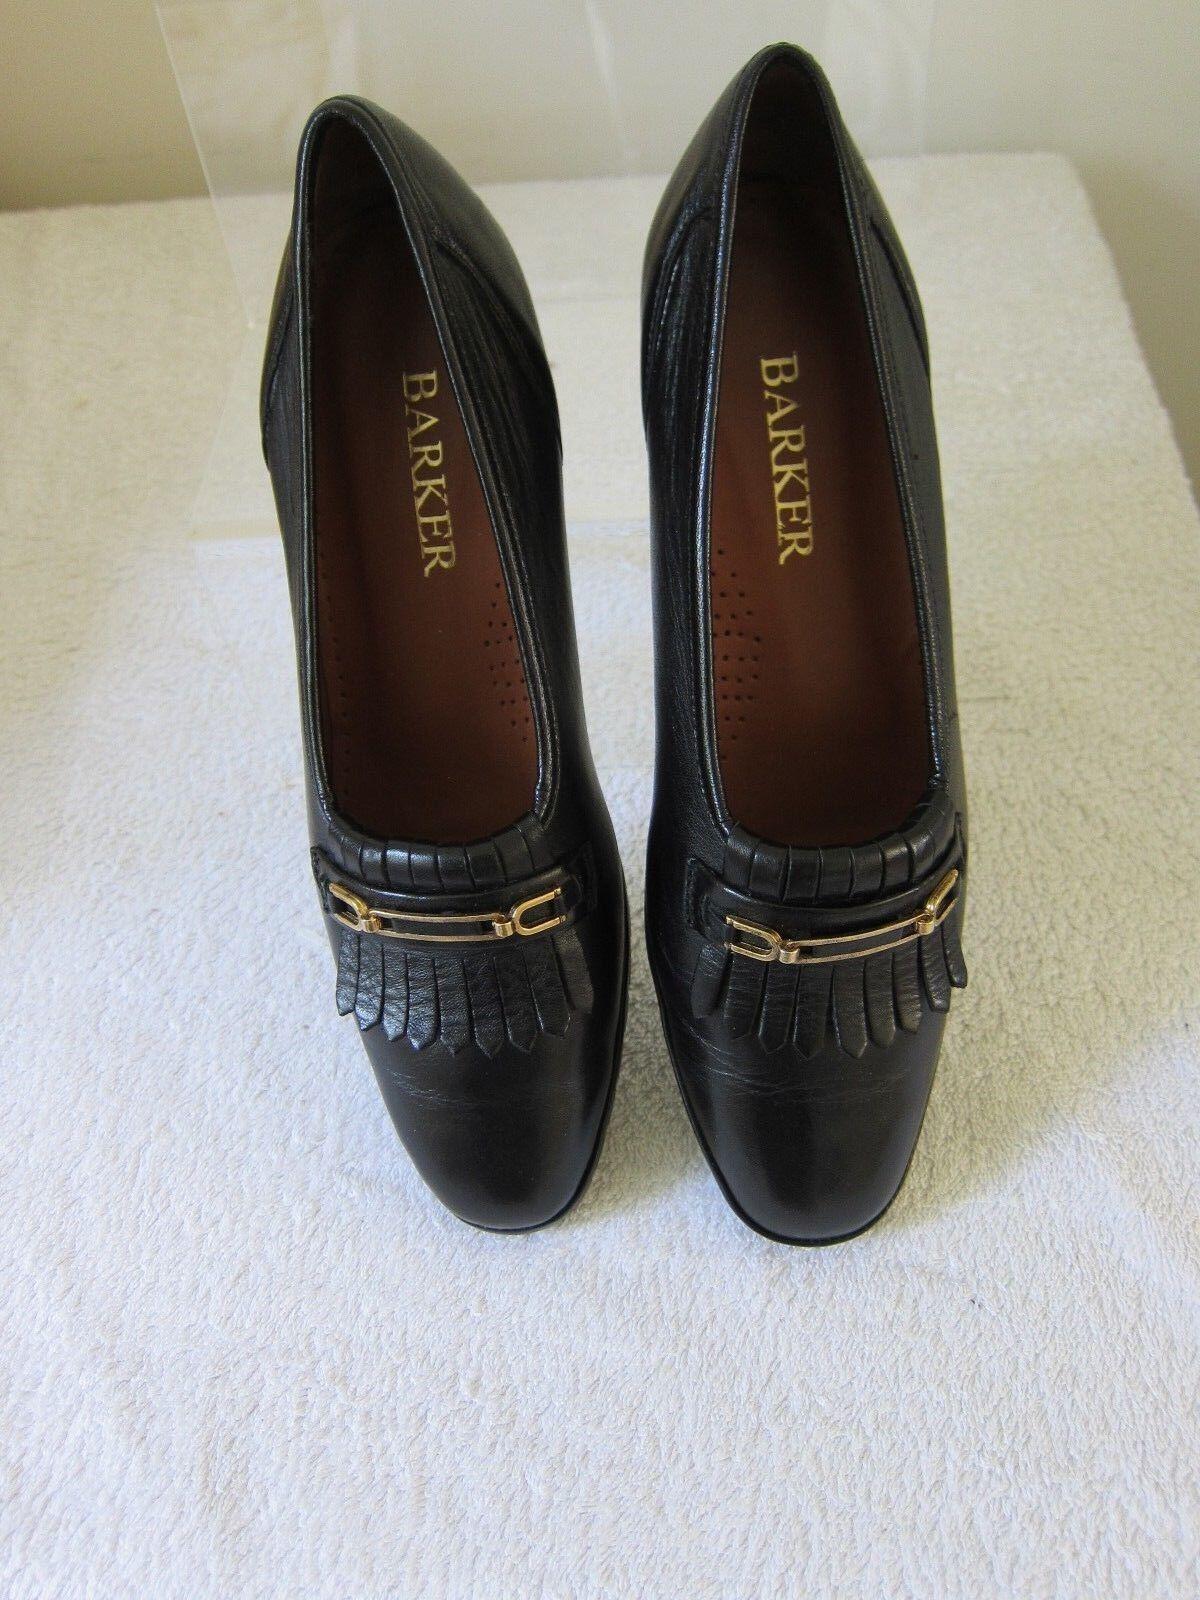 Barker England Rita Womens Shoe in Black Size 4-4.5  RRP £80